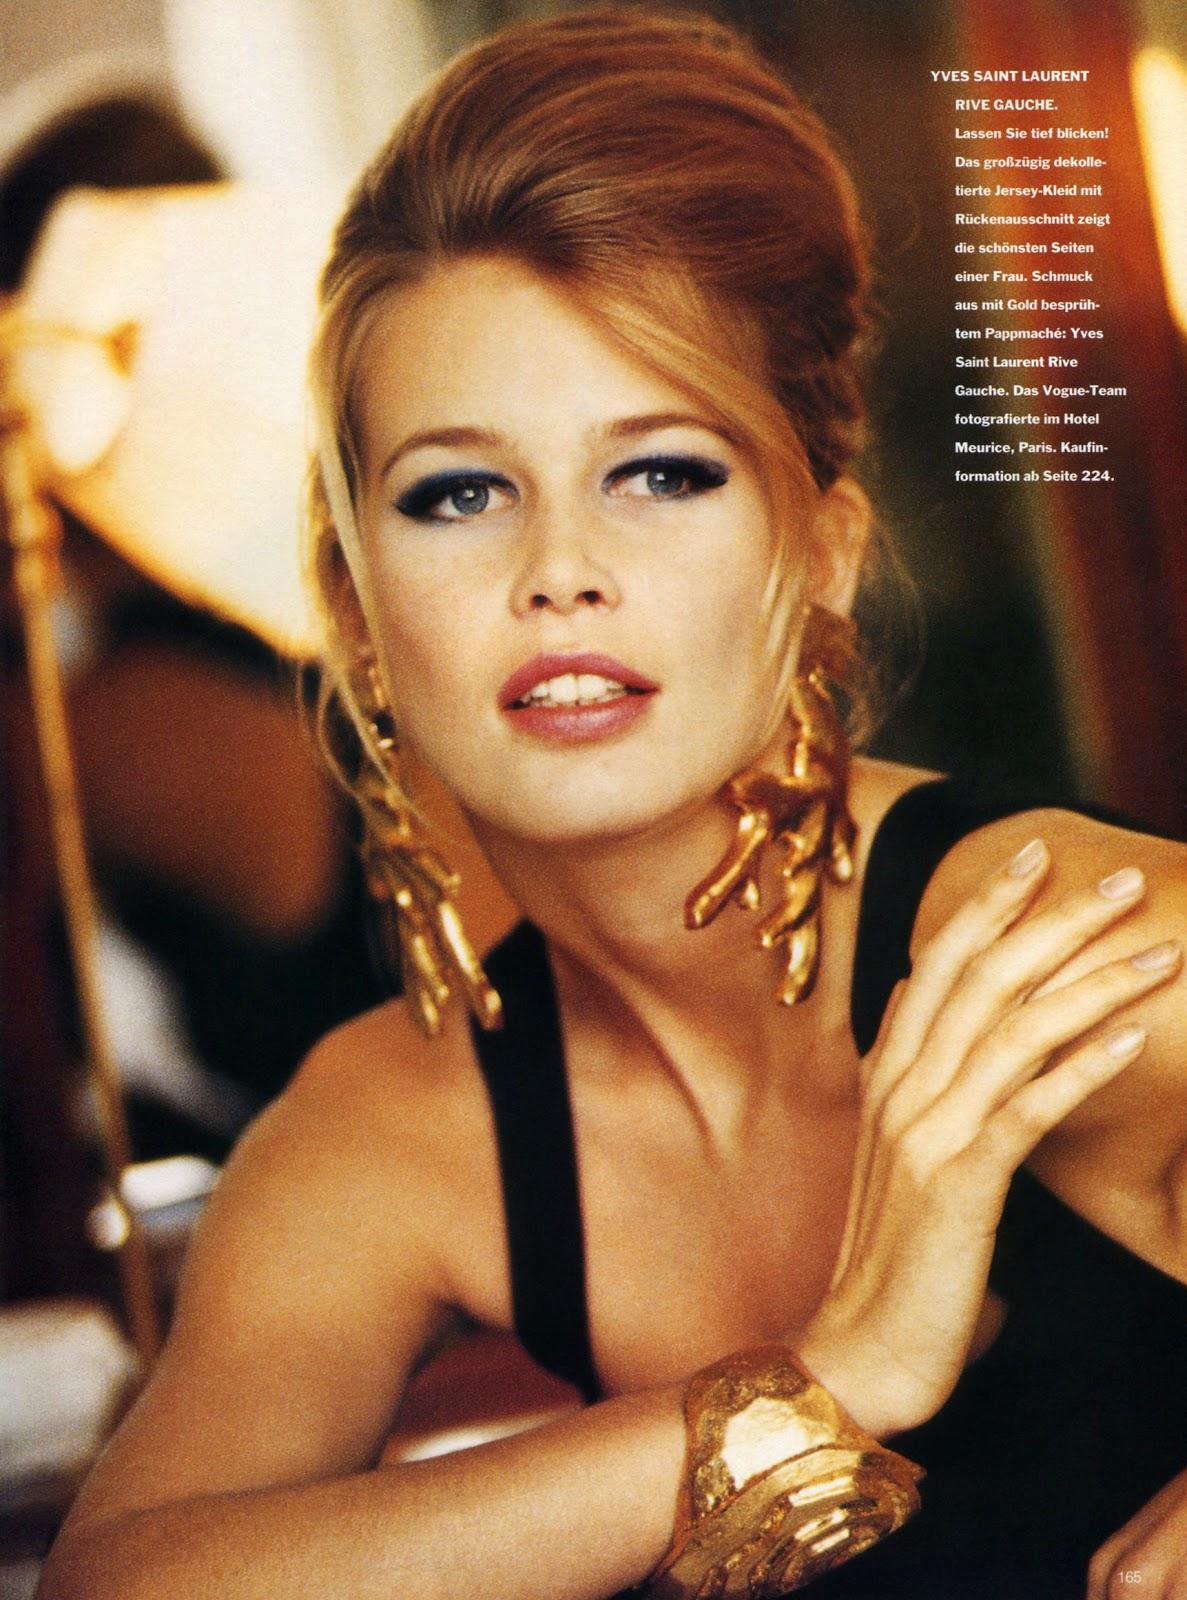 Vogue (Germany) January 1991 | Das Kleine 04.jpg